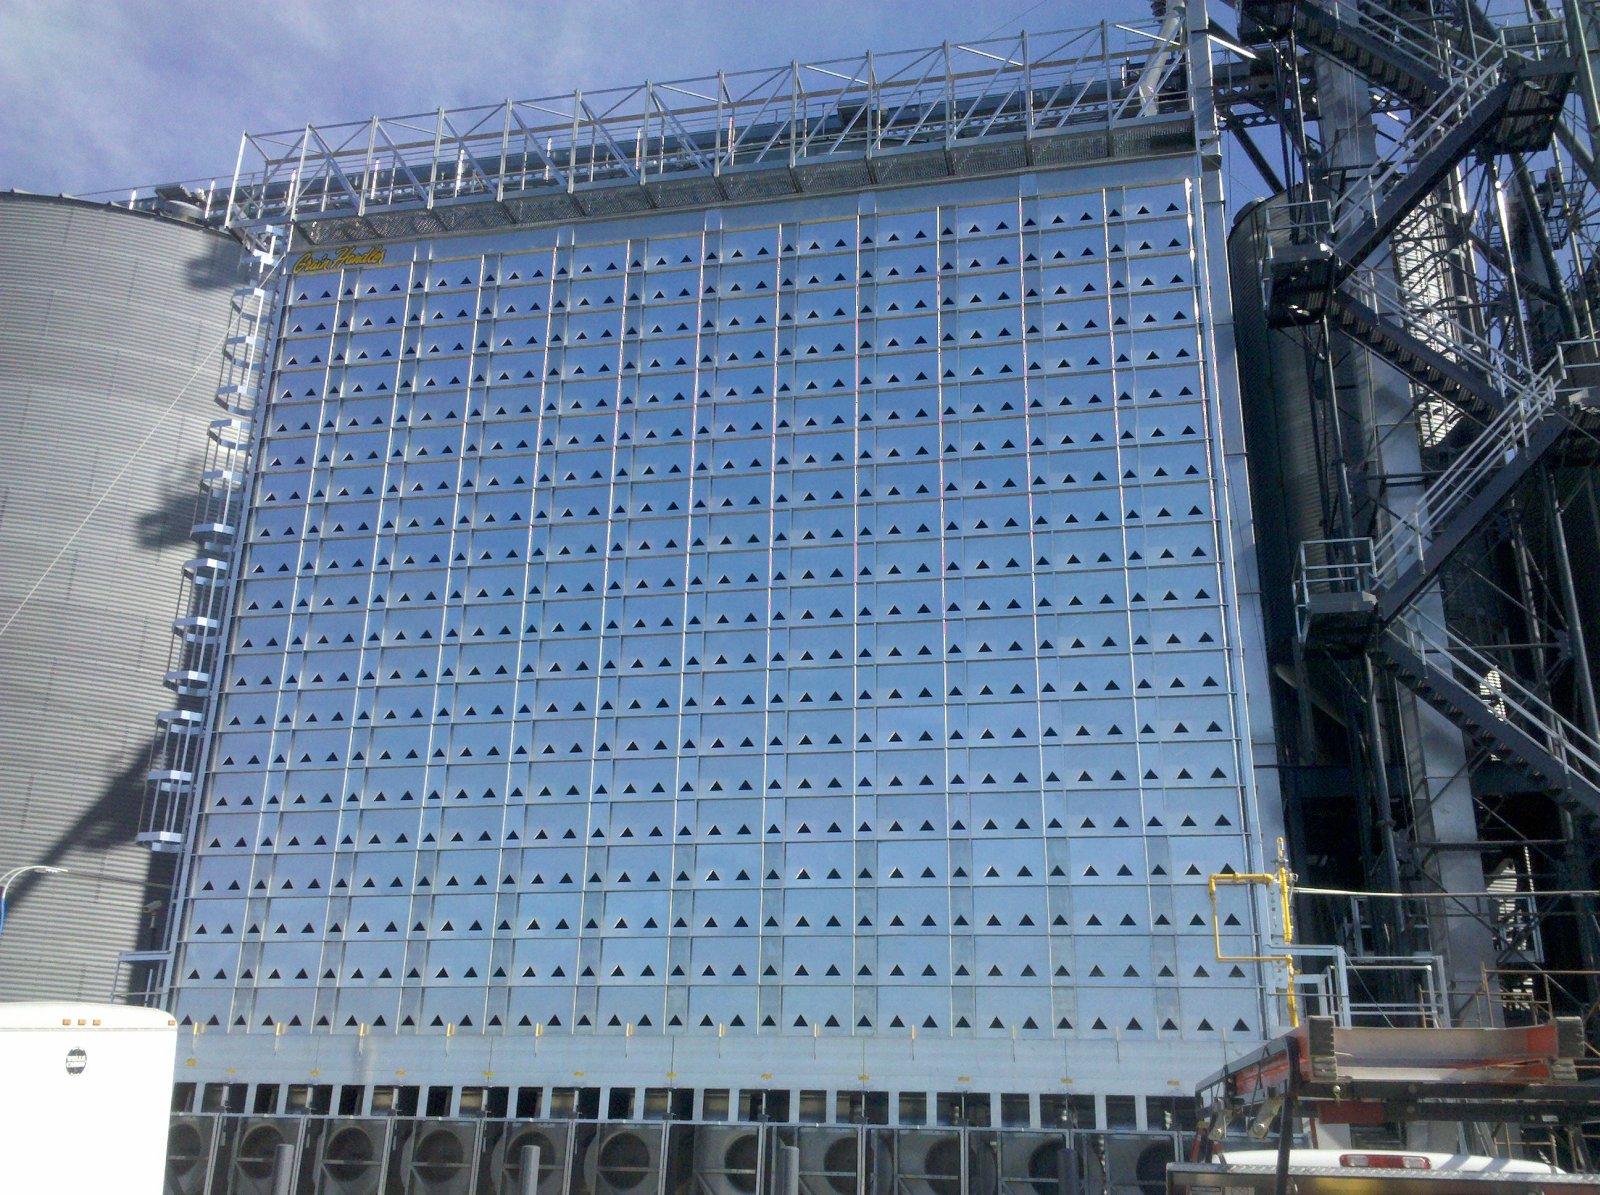 Grain Handler Grain Dryers | R & S Grain Systems - Dexter, MN